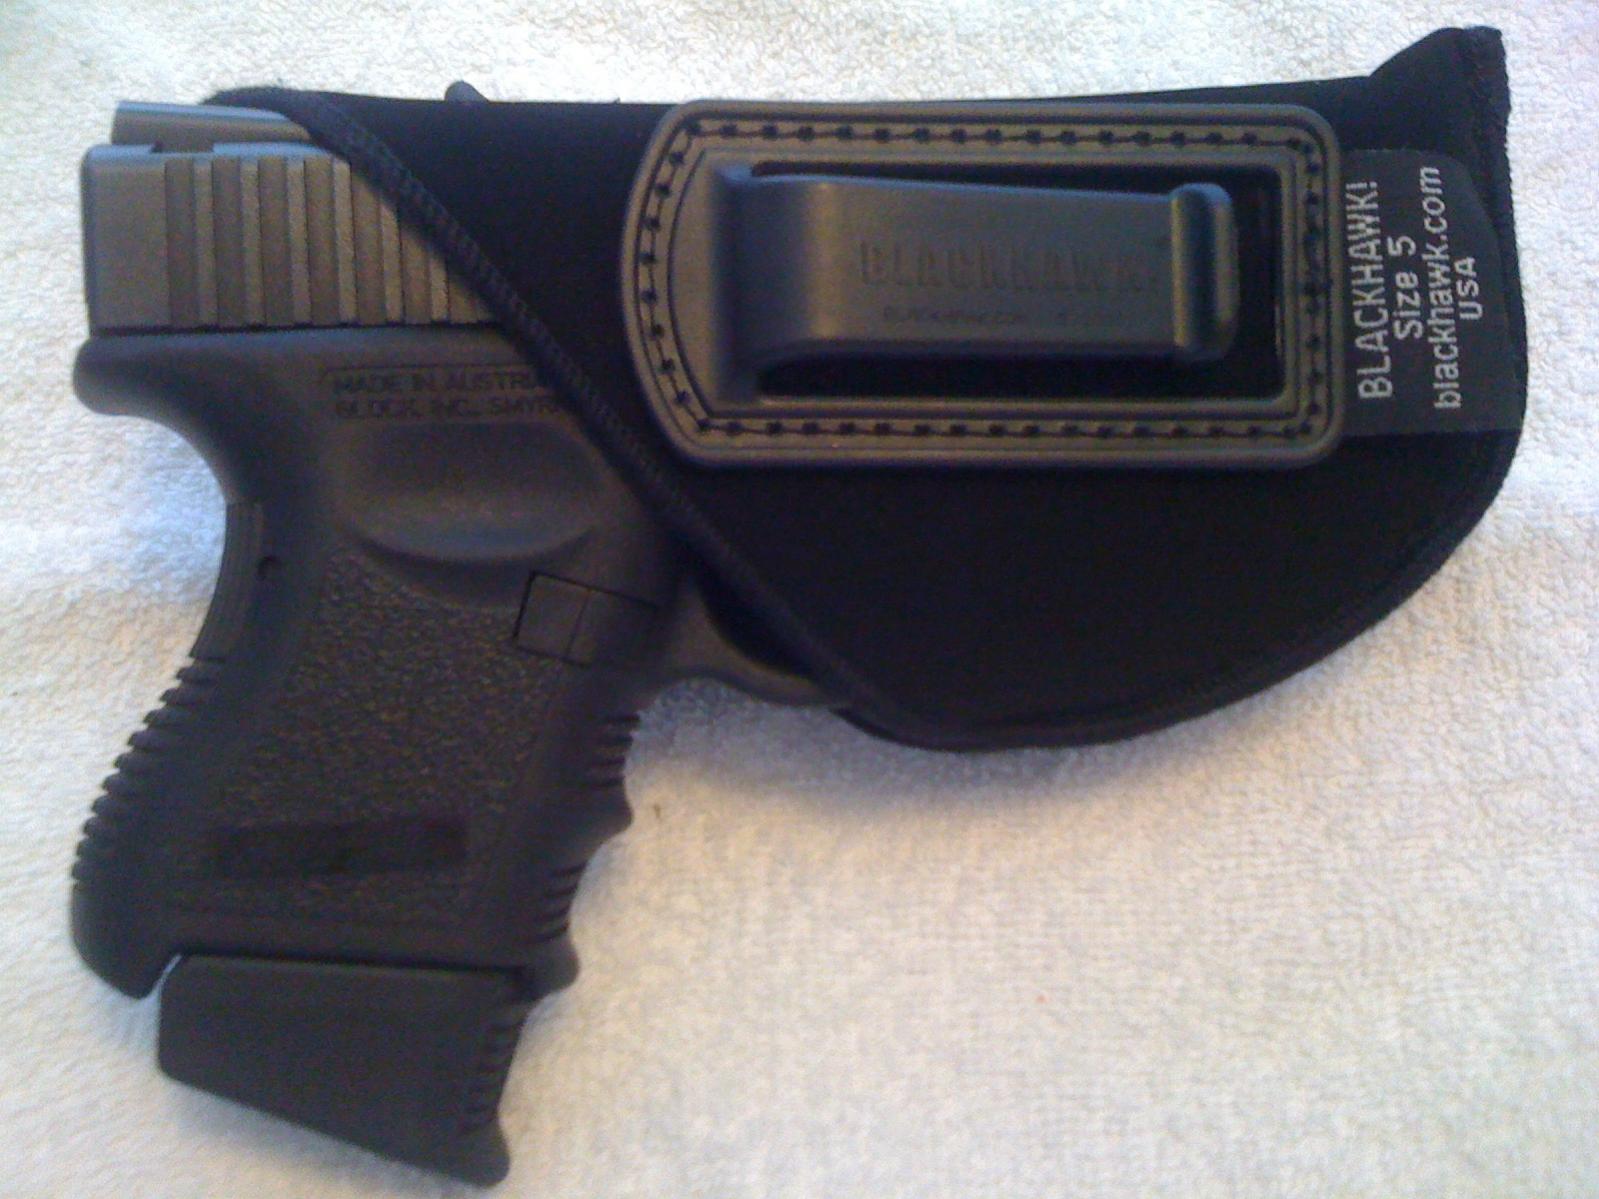 Another glock!!!-photo-3-.jpg